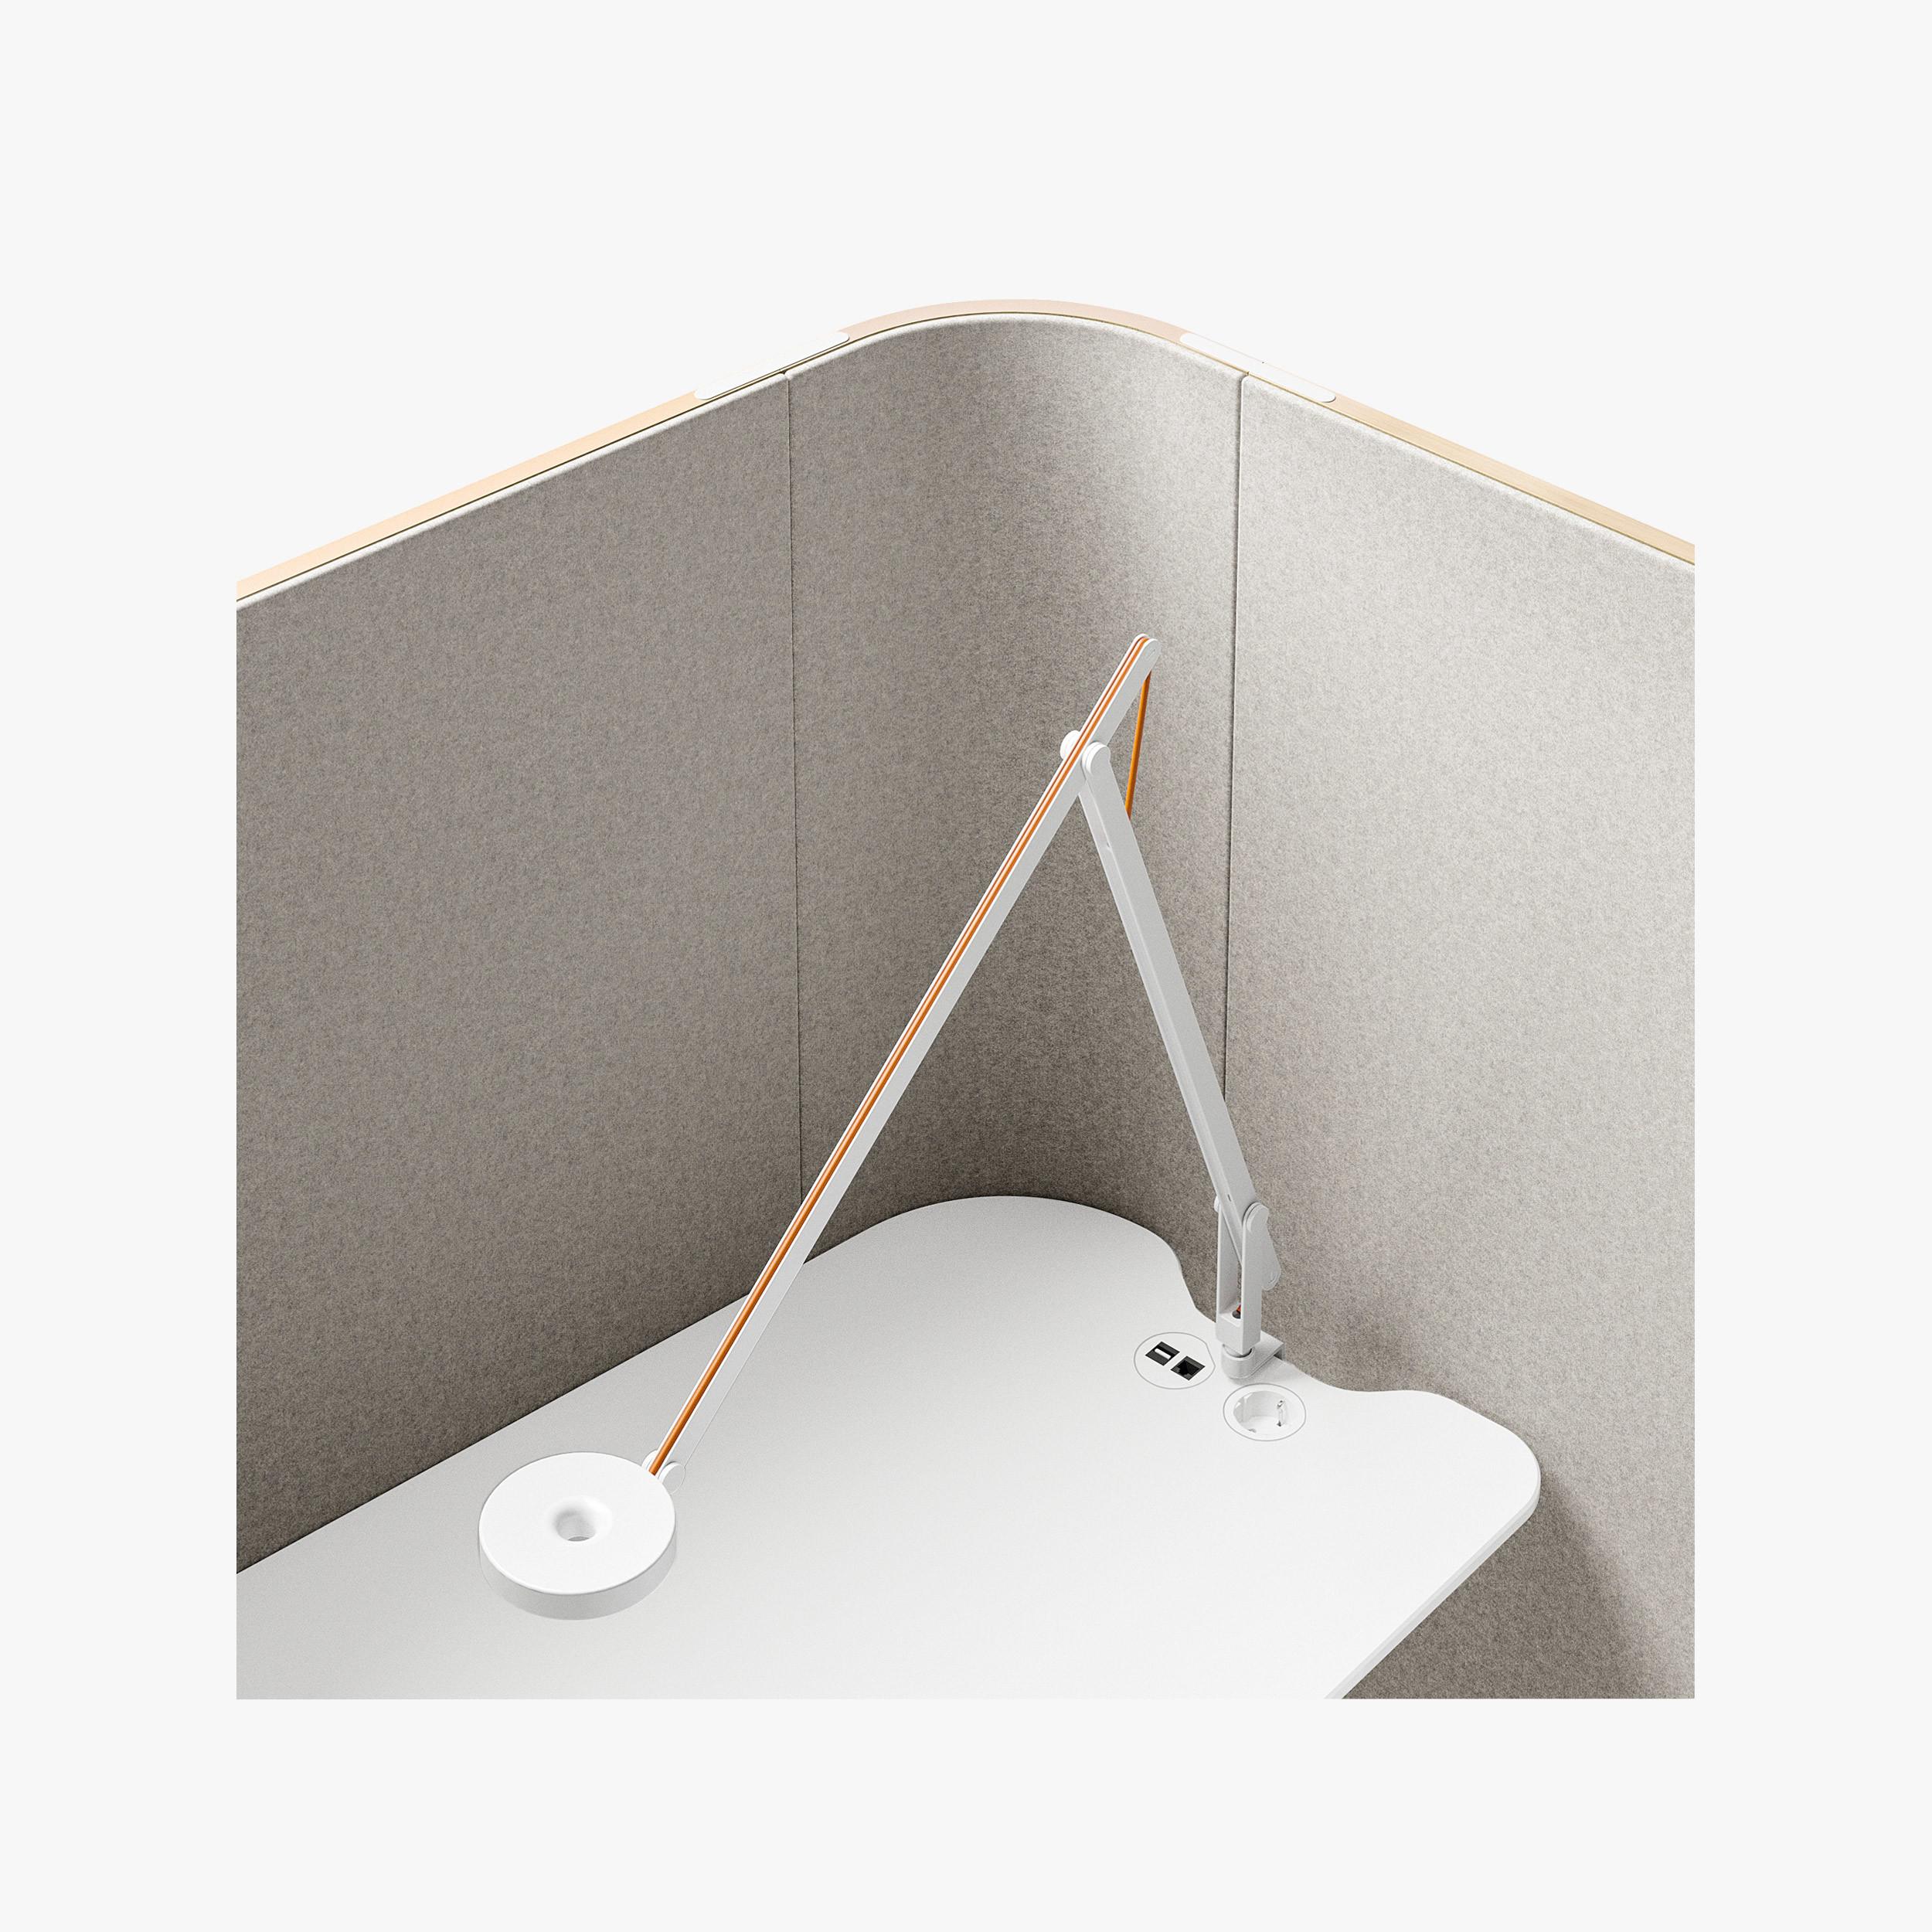 Sinetica We Meet Individual Cubicle Detail Image Showing Lamp